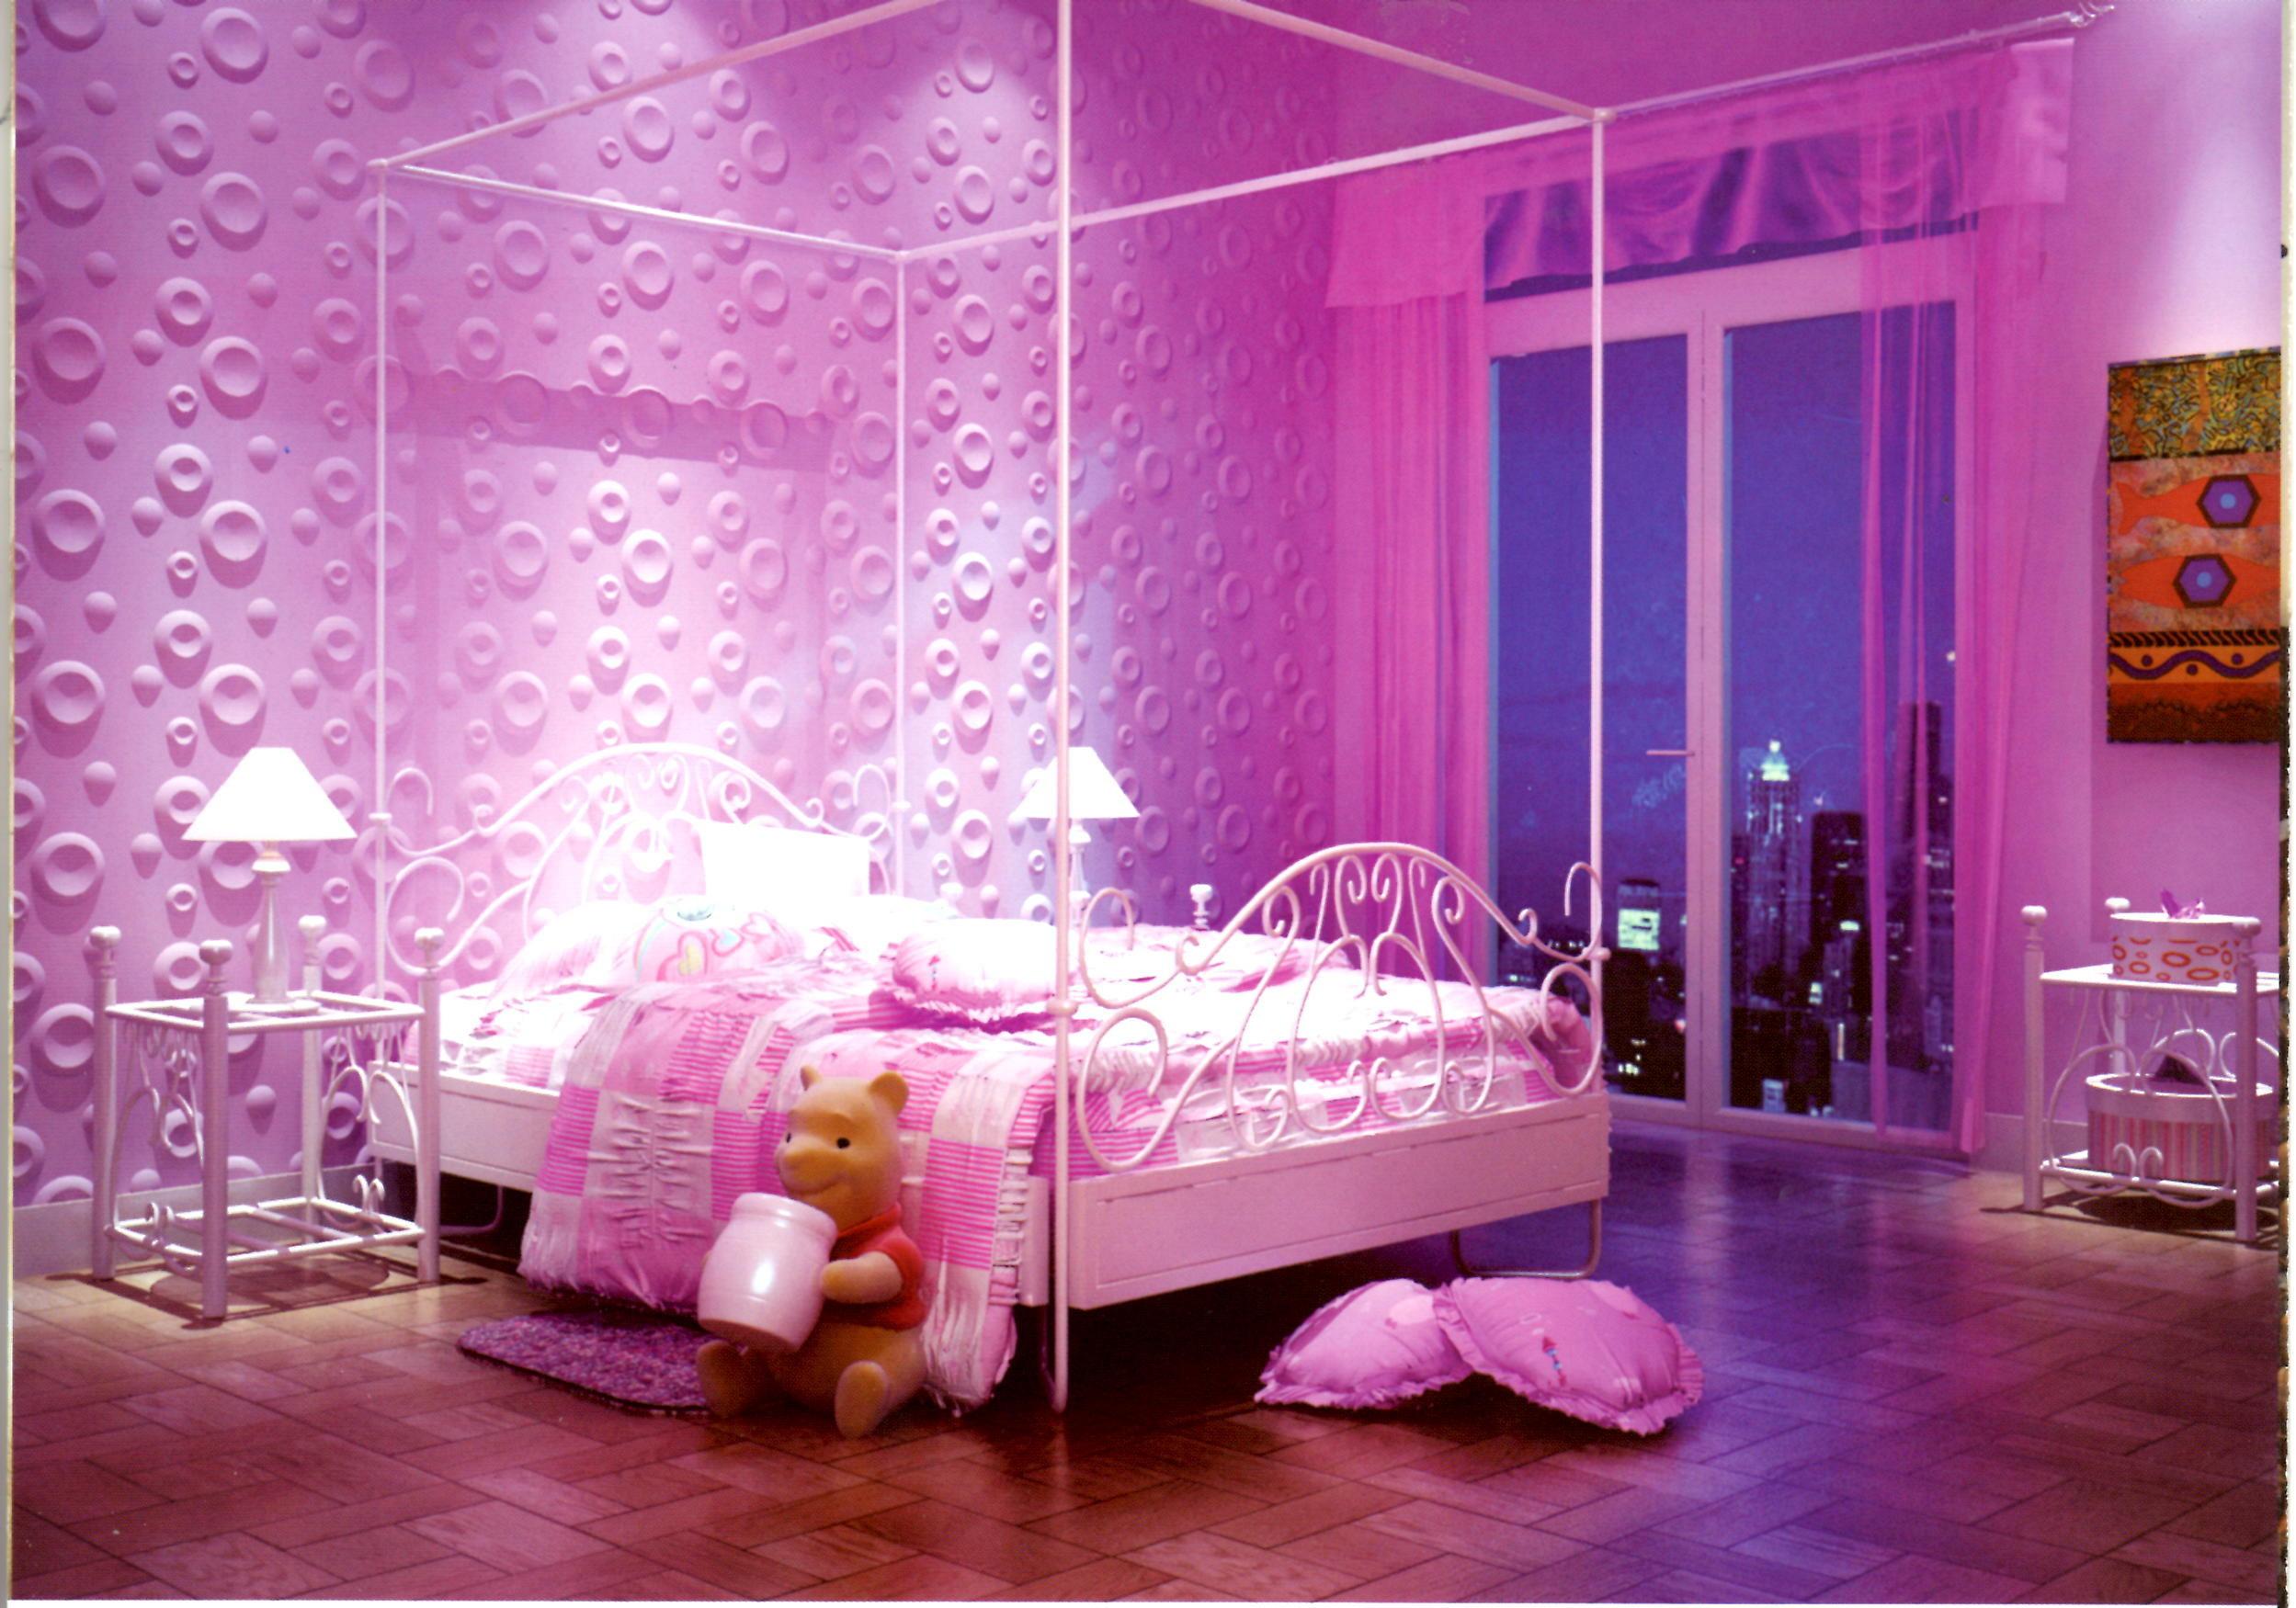 Full Size of Bedroom Vinyl Wallpaper Wallpaper Decor Wallpaper Shops  Wallpaper For Bedroom Wall With Pink …